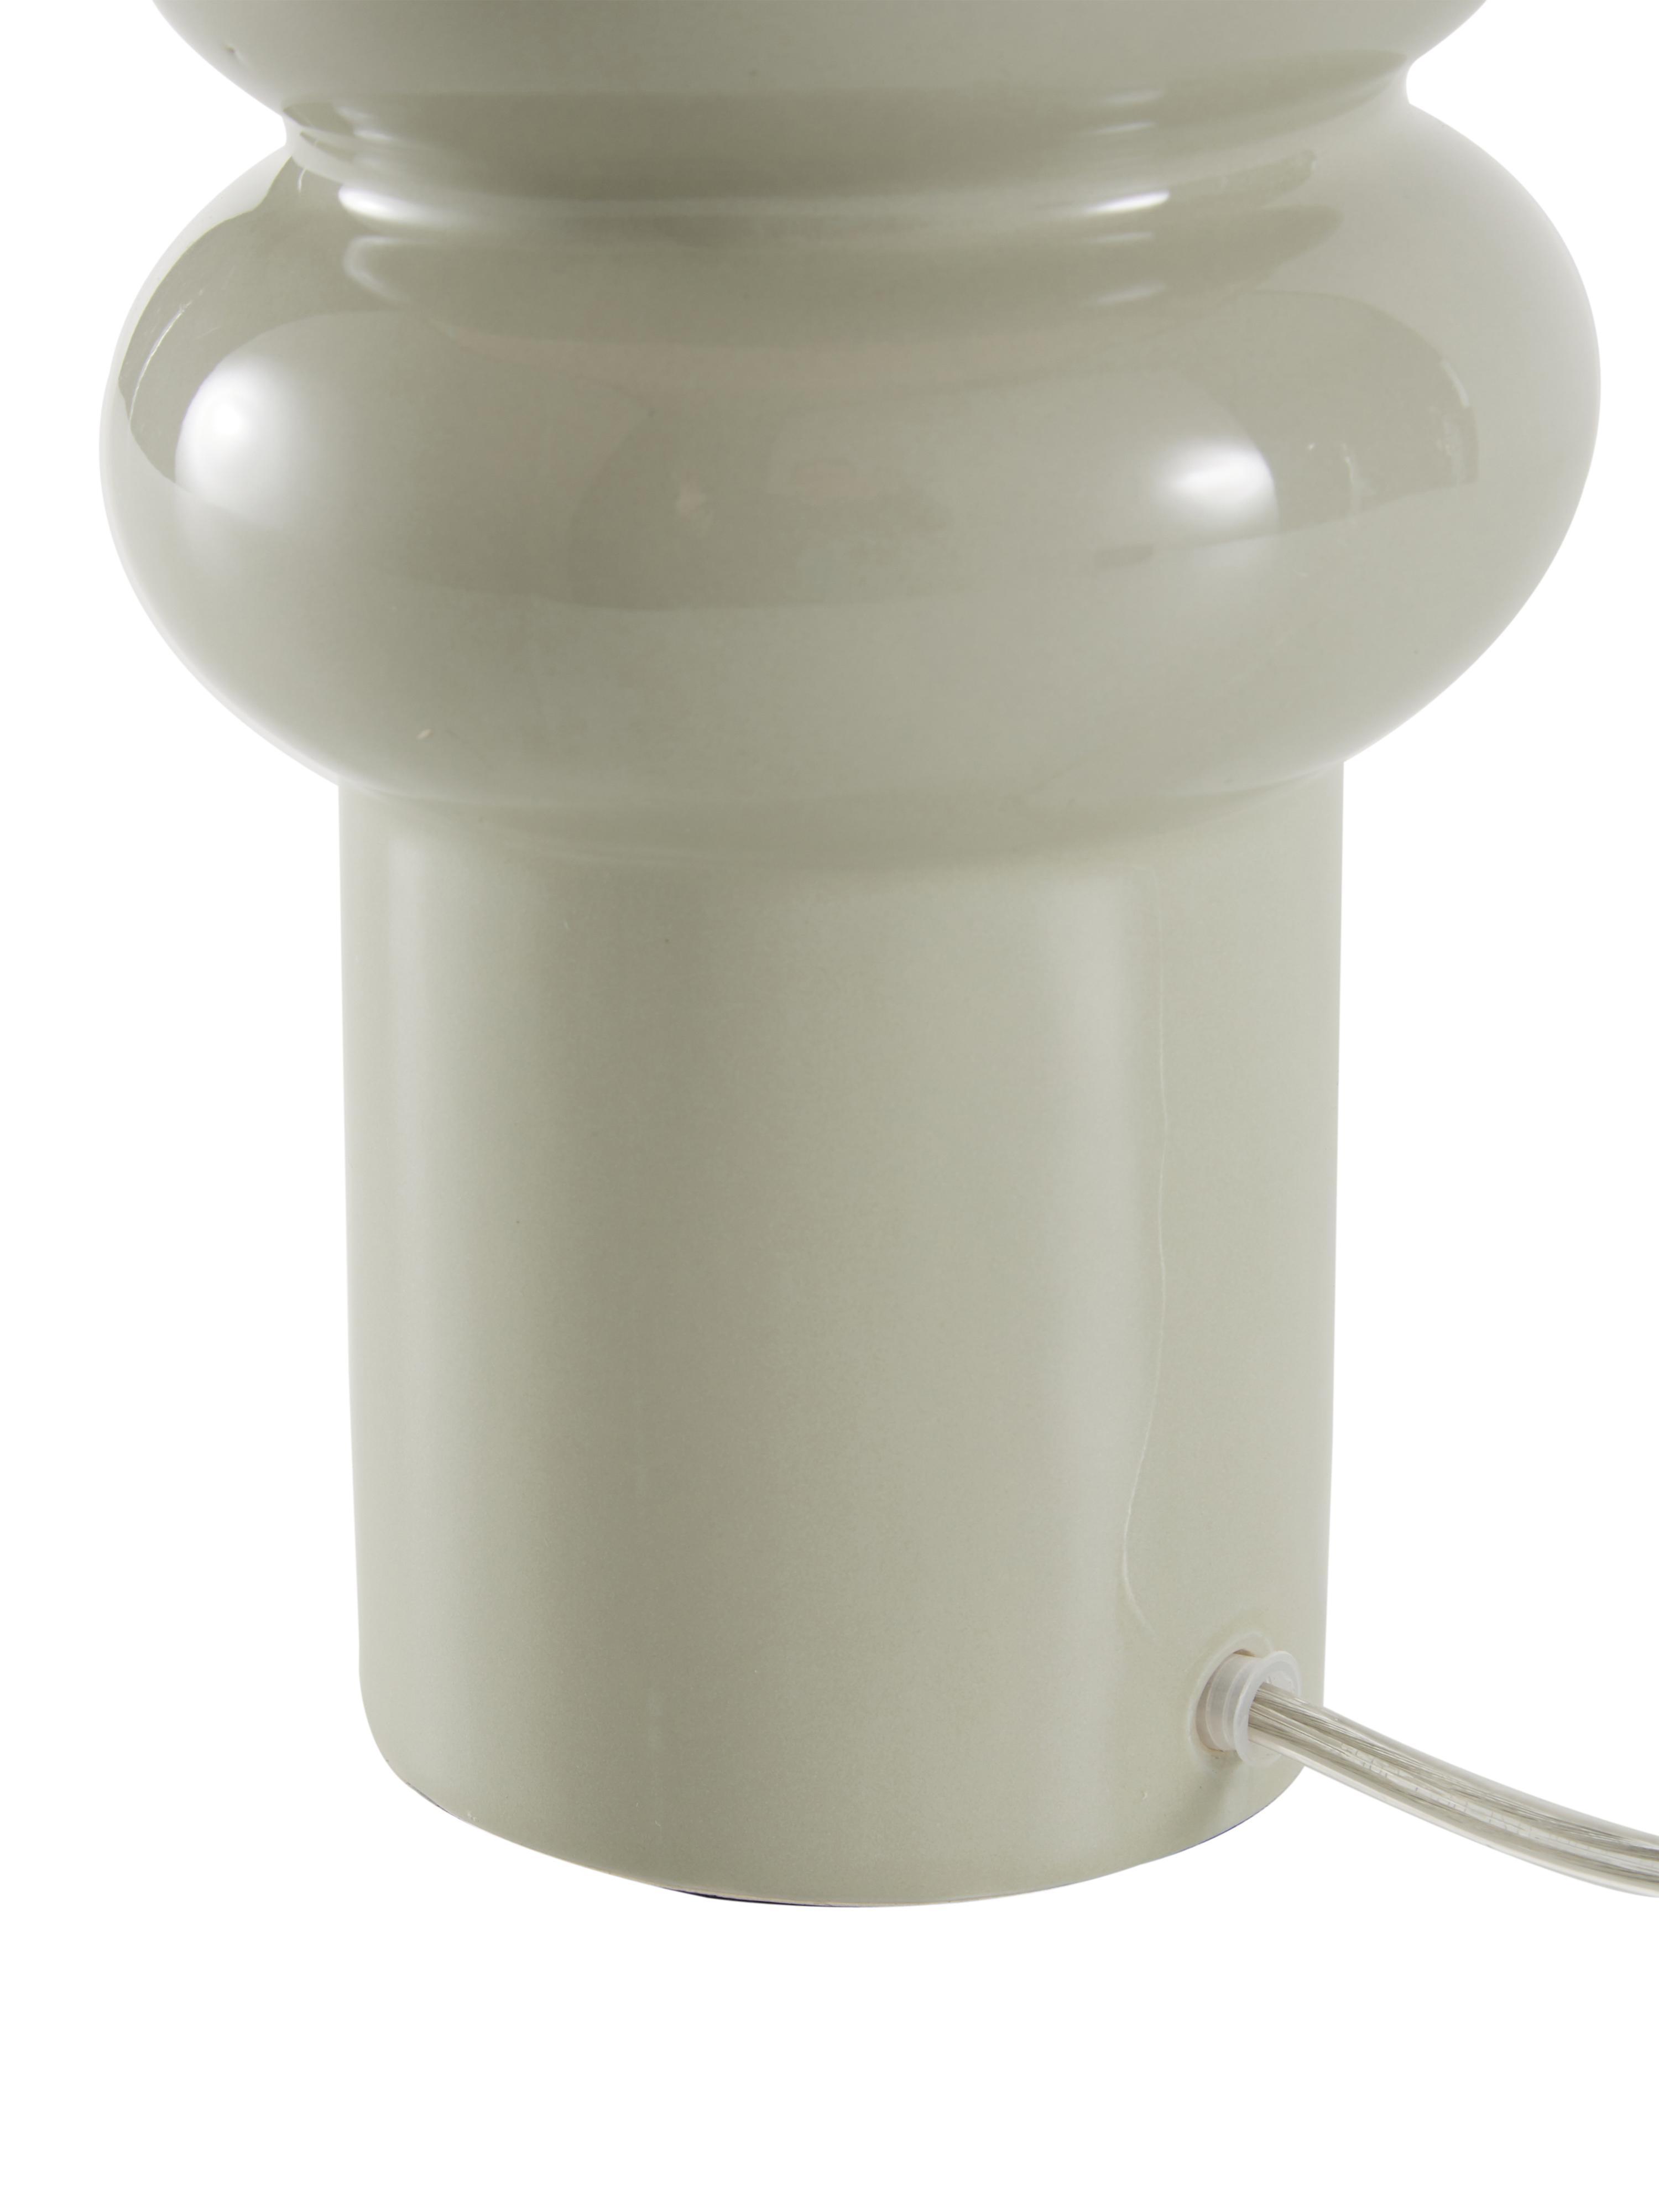 Keramik-Tischlampe Christine, Lampenschirm: Textil, Lampenfuß: Keramik, Dekor: Metall, vermessingt, Beige, Grau, Ø 28 x H 53 cm